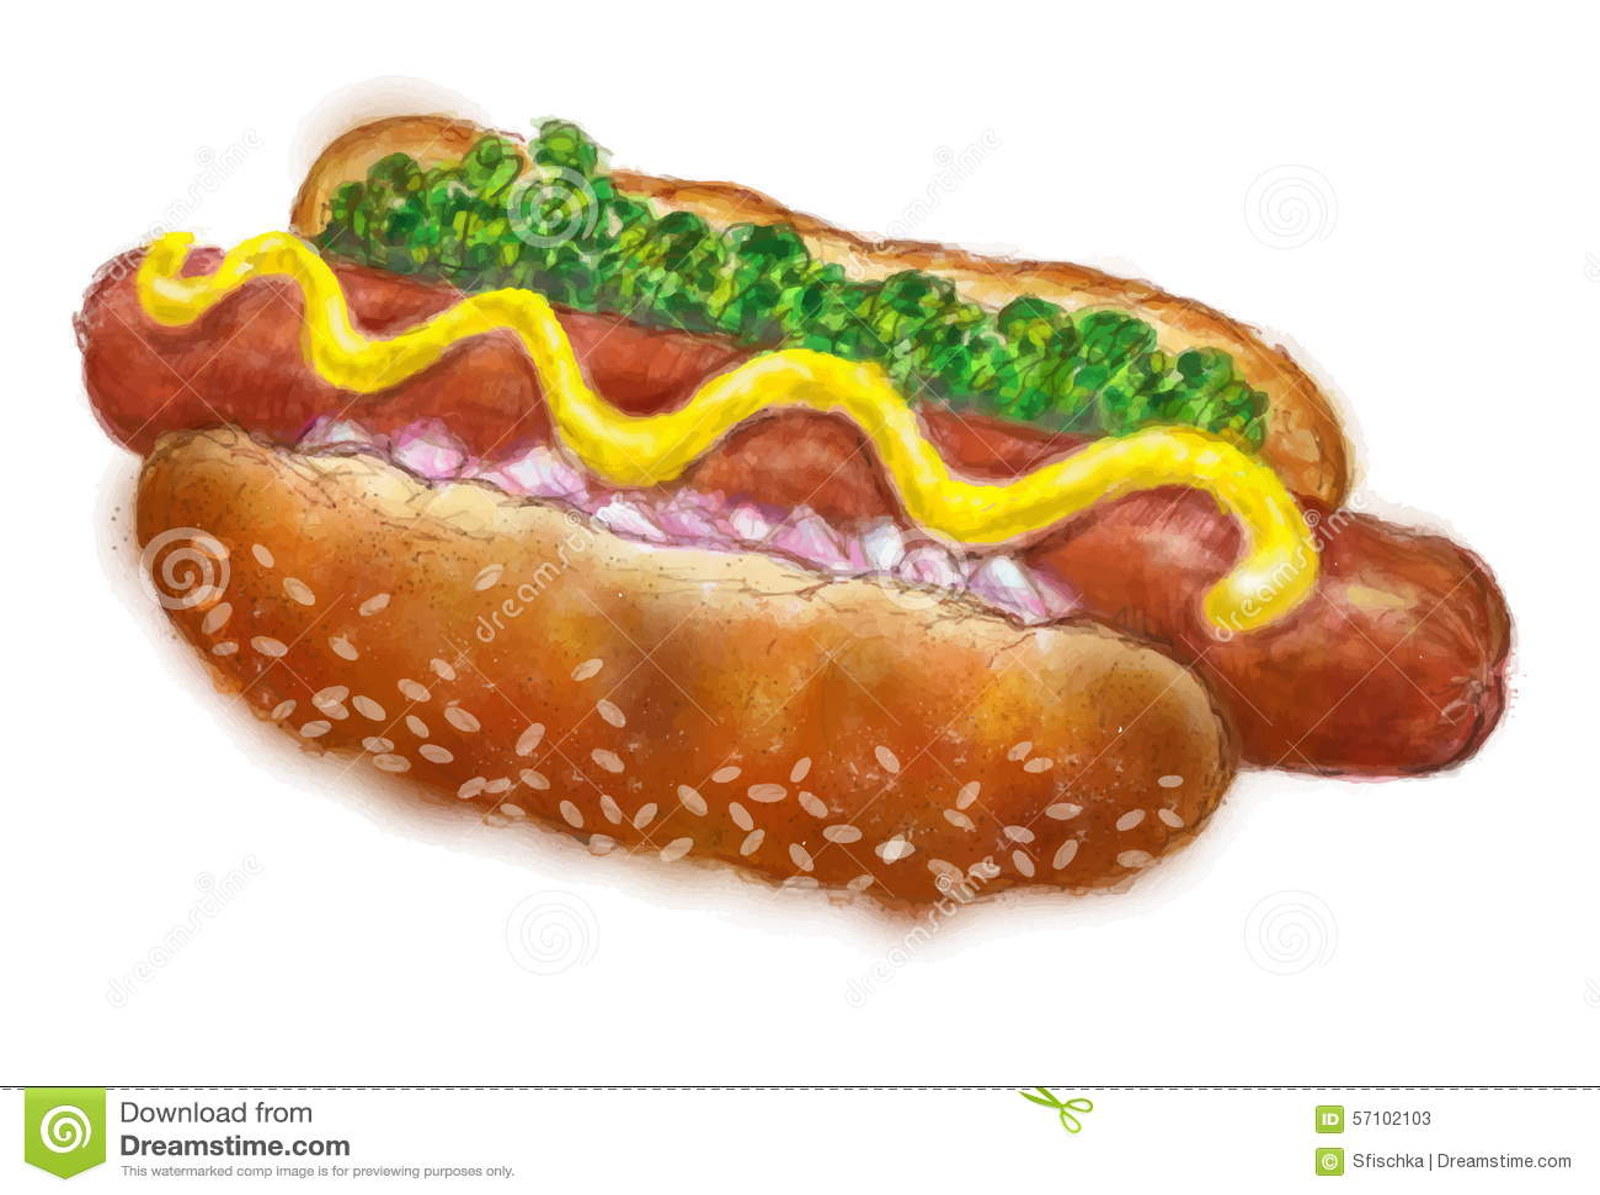 Total Cost Breakdown For Hot Dog Cart Business Startups (Spreadsheet)